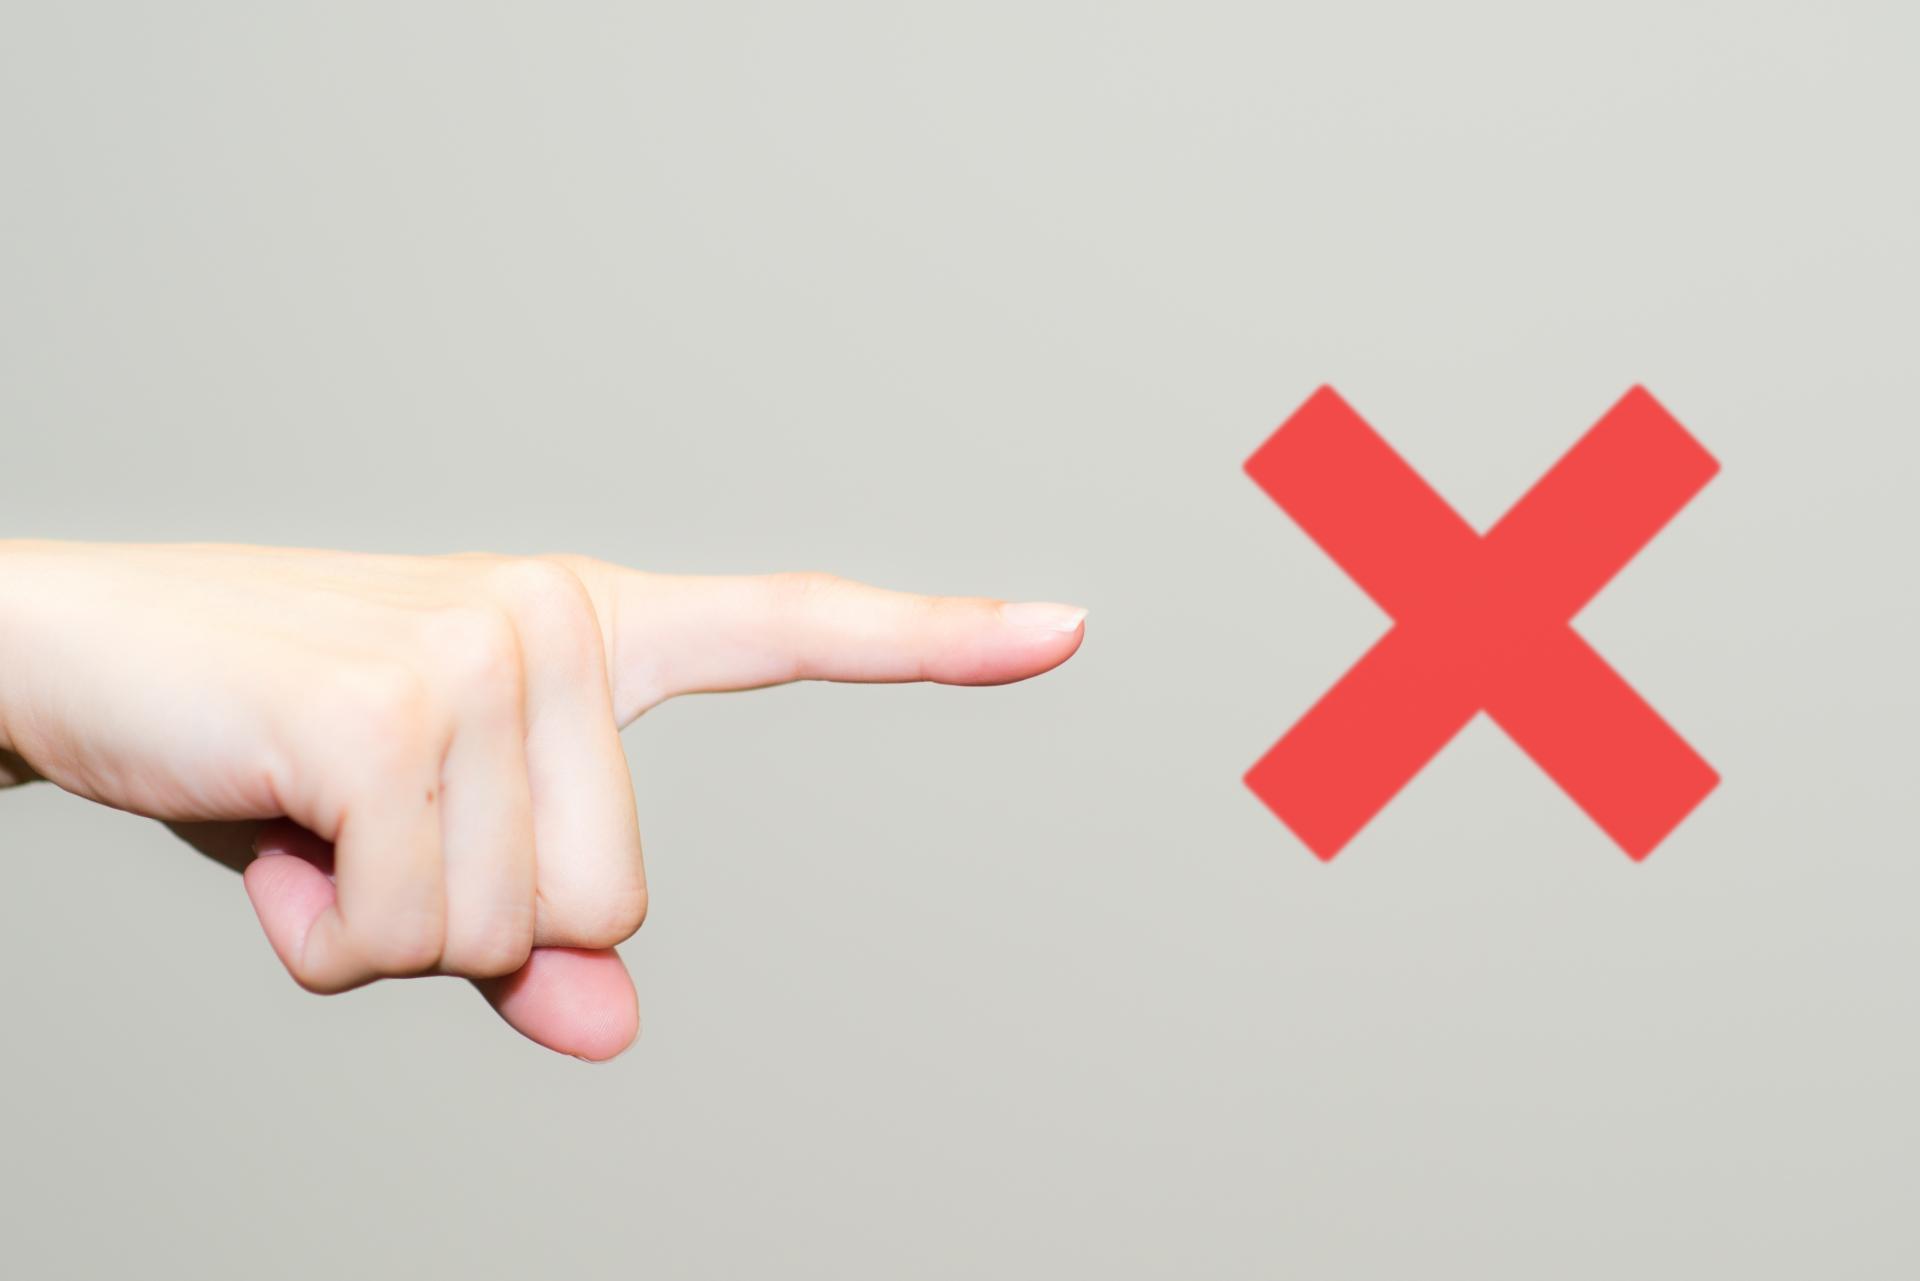 Amazonギフト券で注文した場合のキャンセル方法